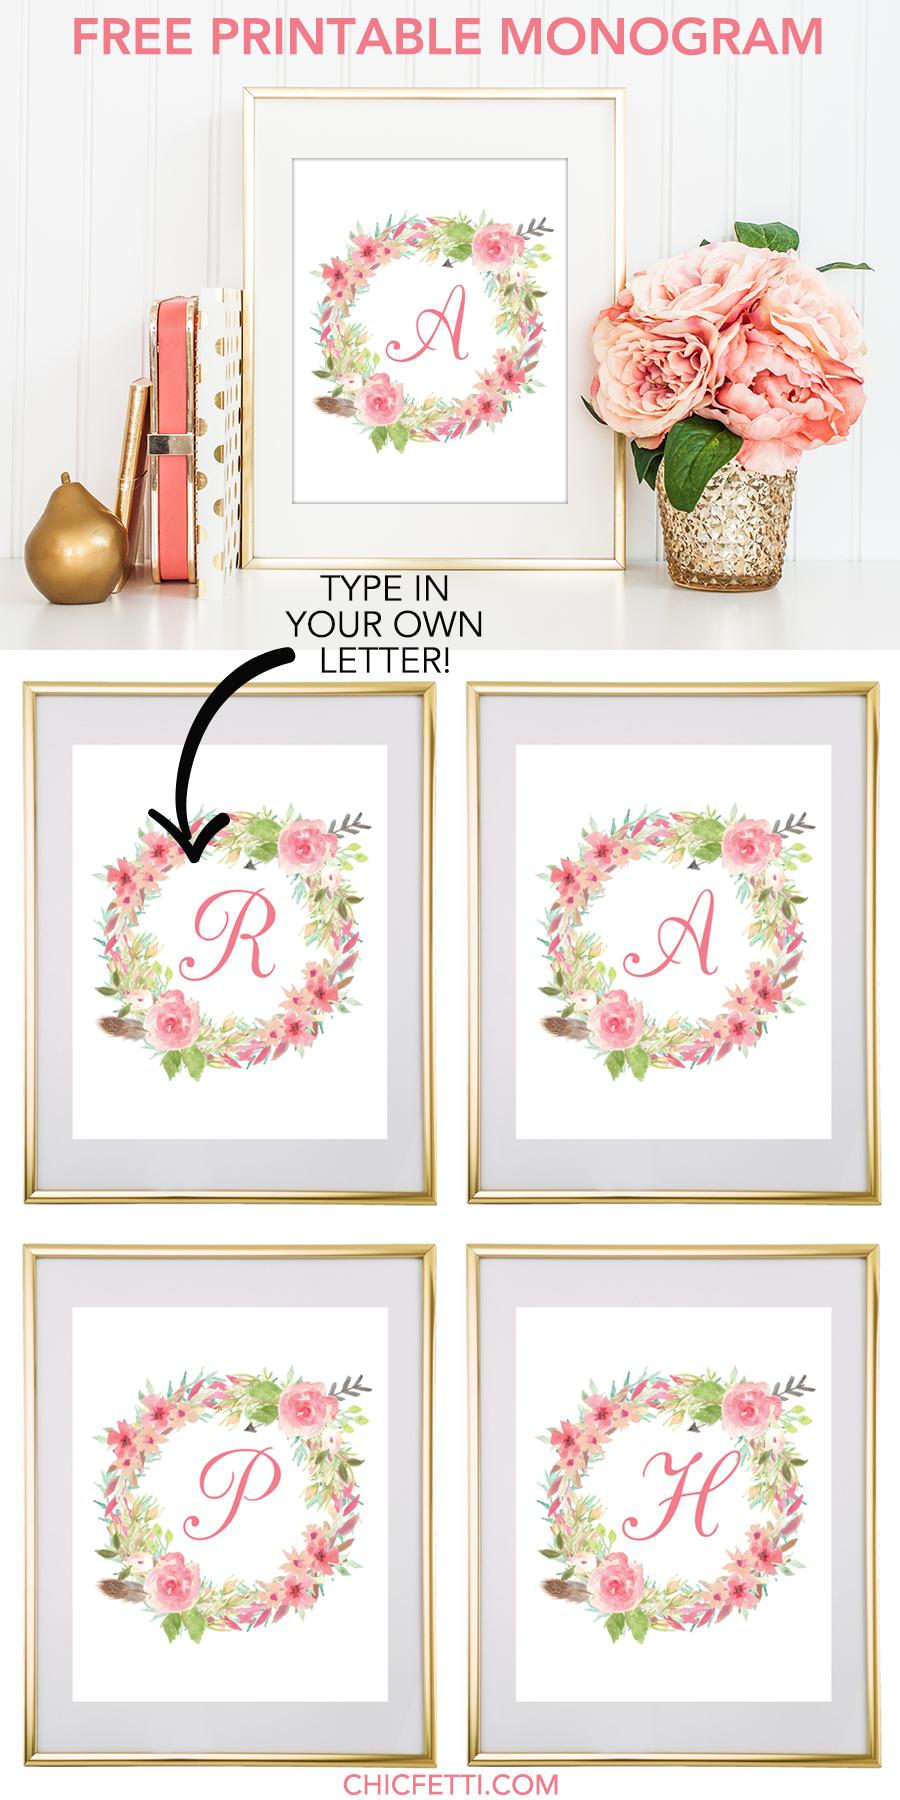 Watercolor Floral Wreath Monogram Maker | Free Printable Monograms - Free Printable Monogram